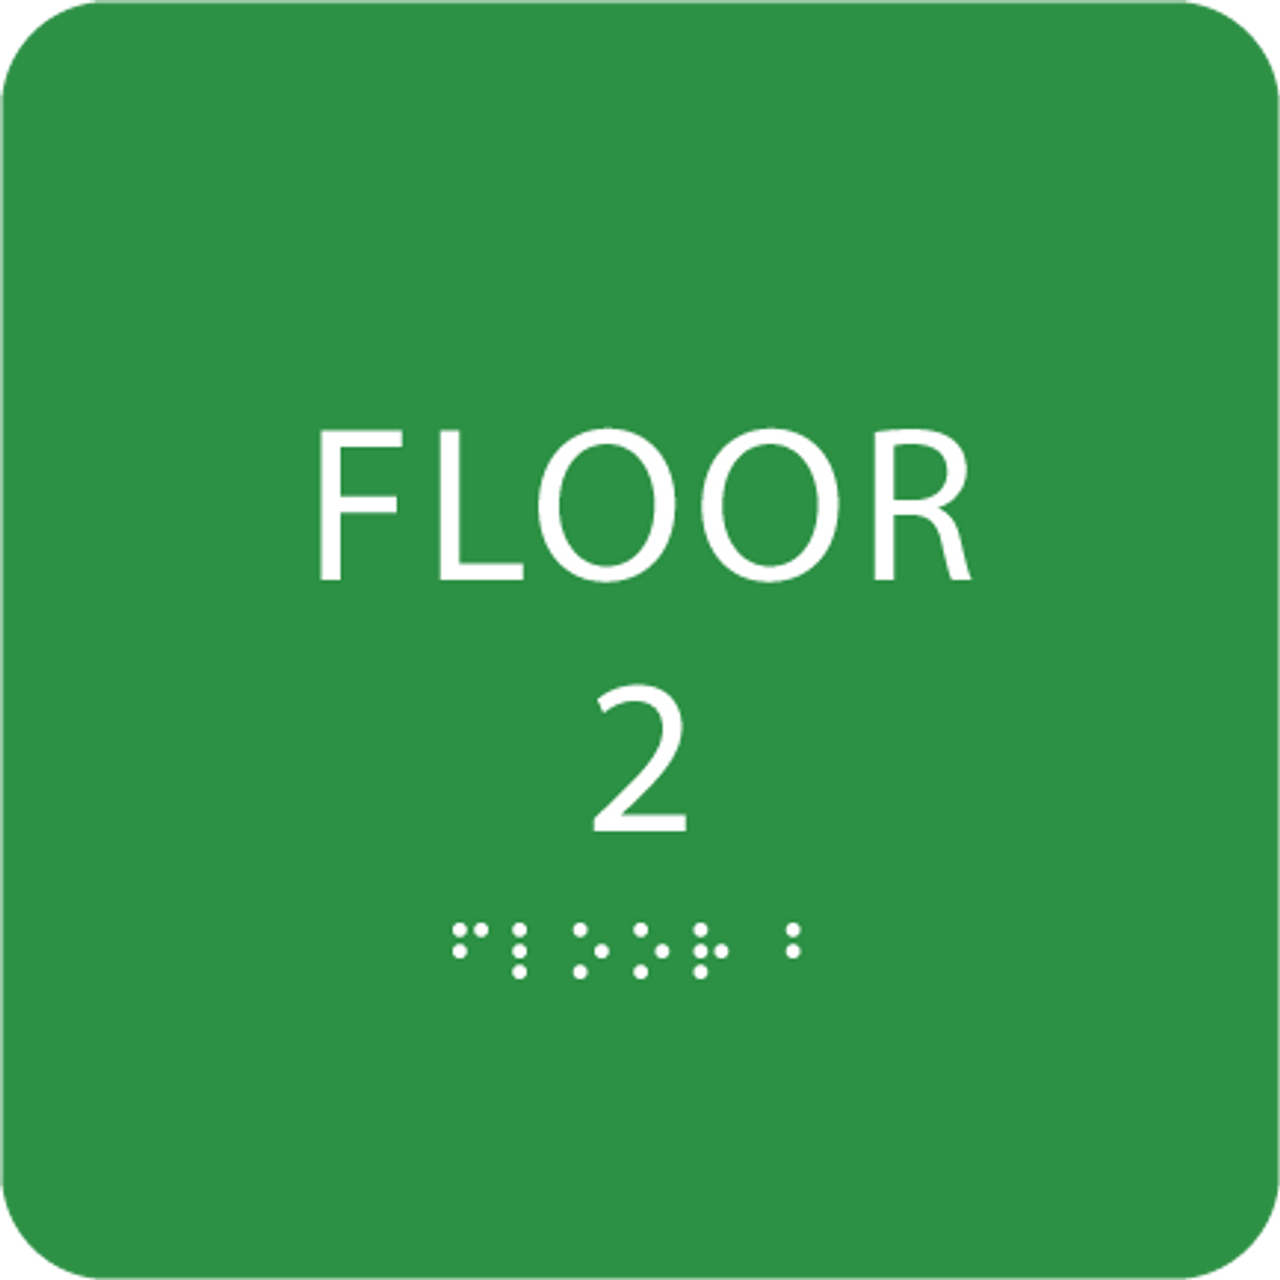 Green Floor 2 Identification Sign